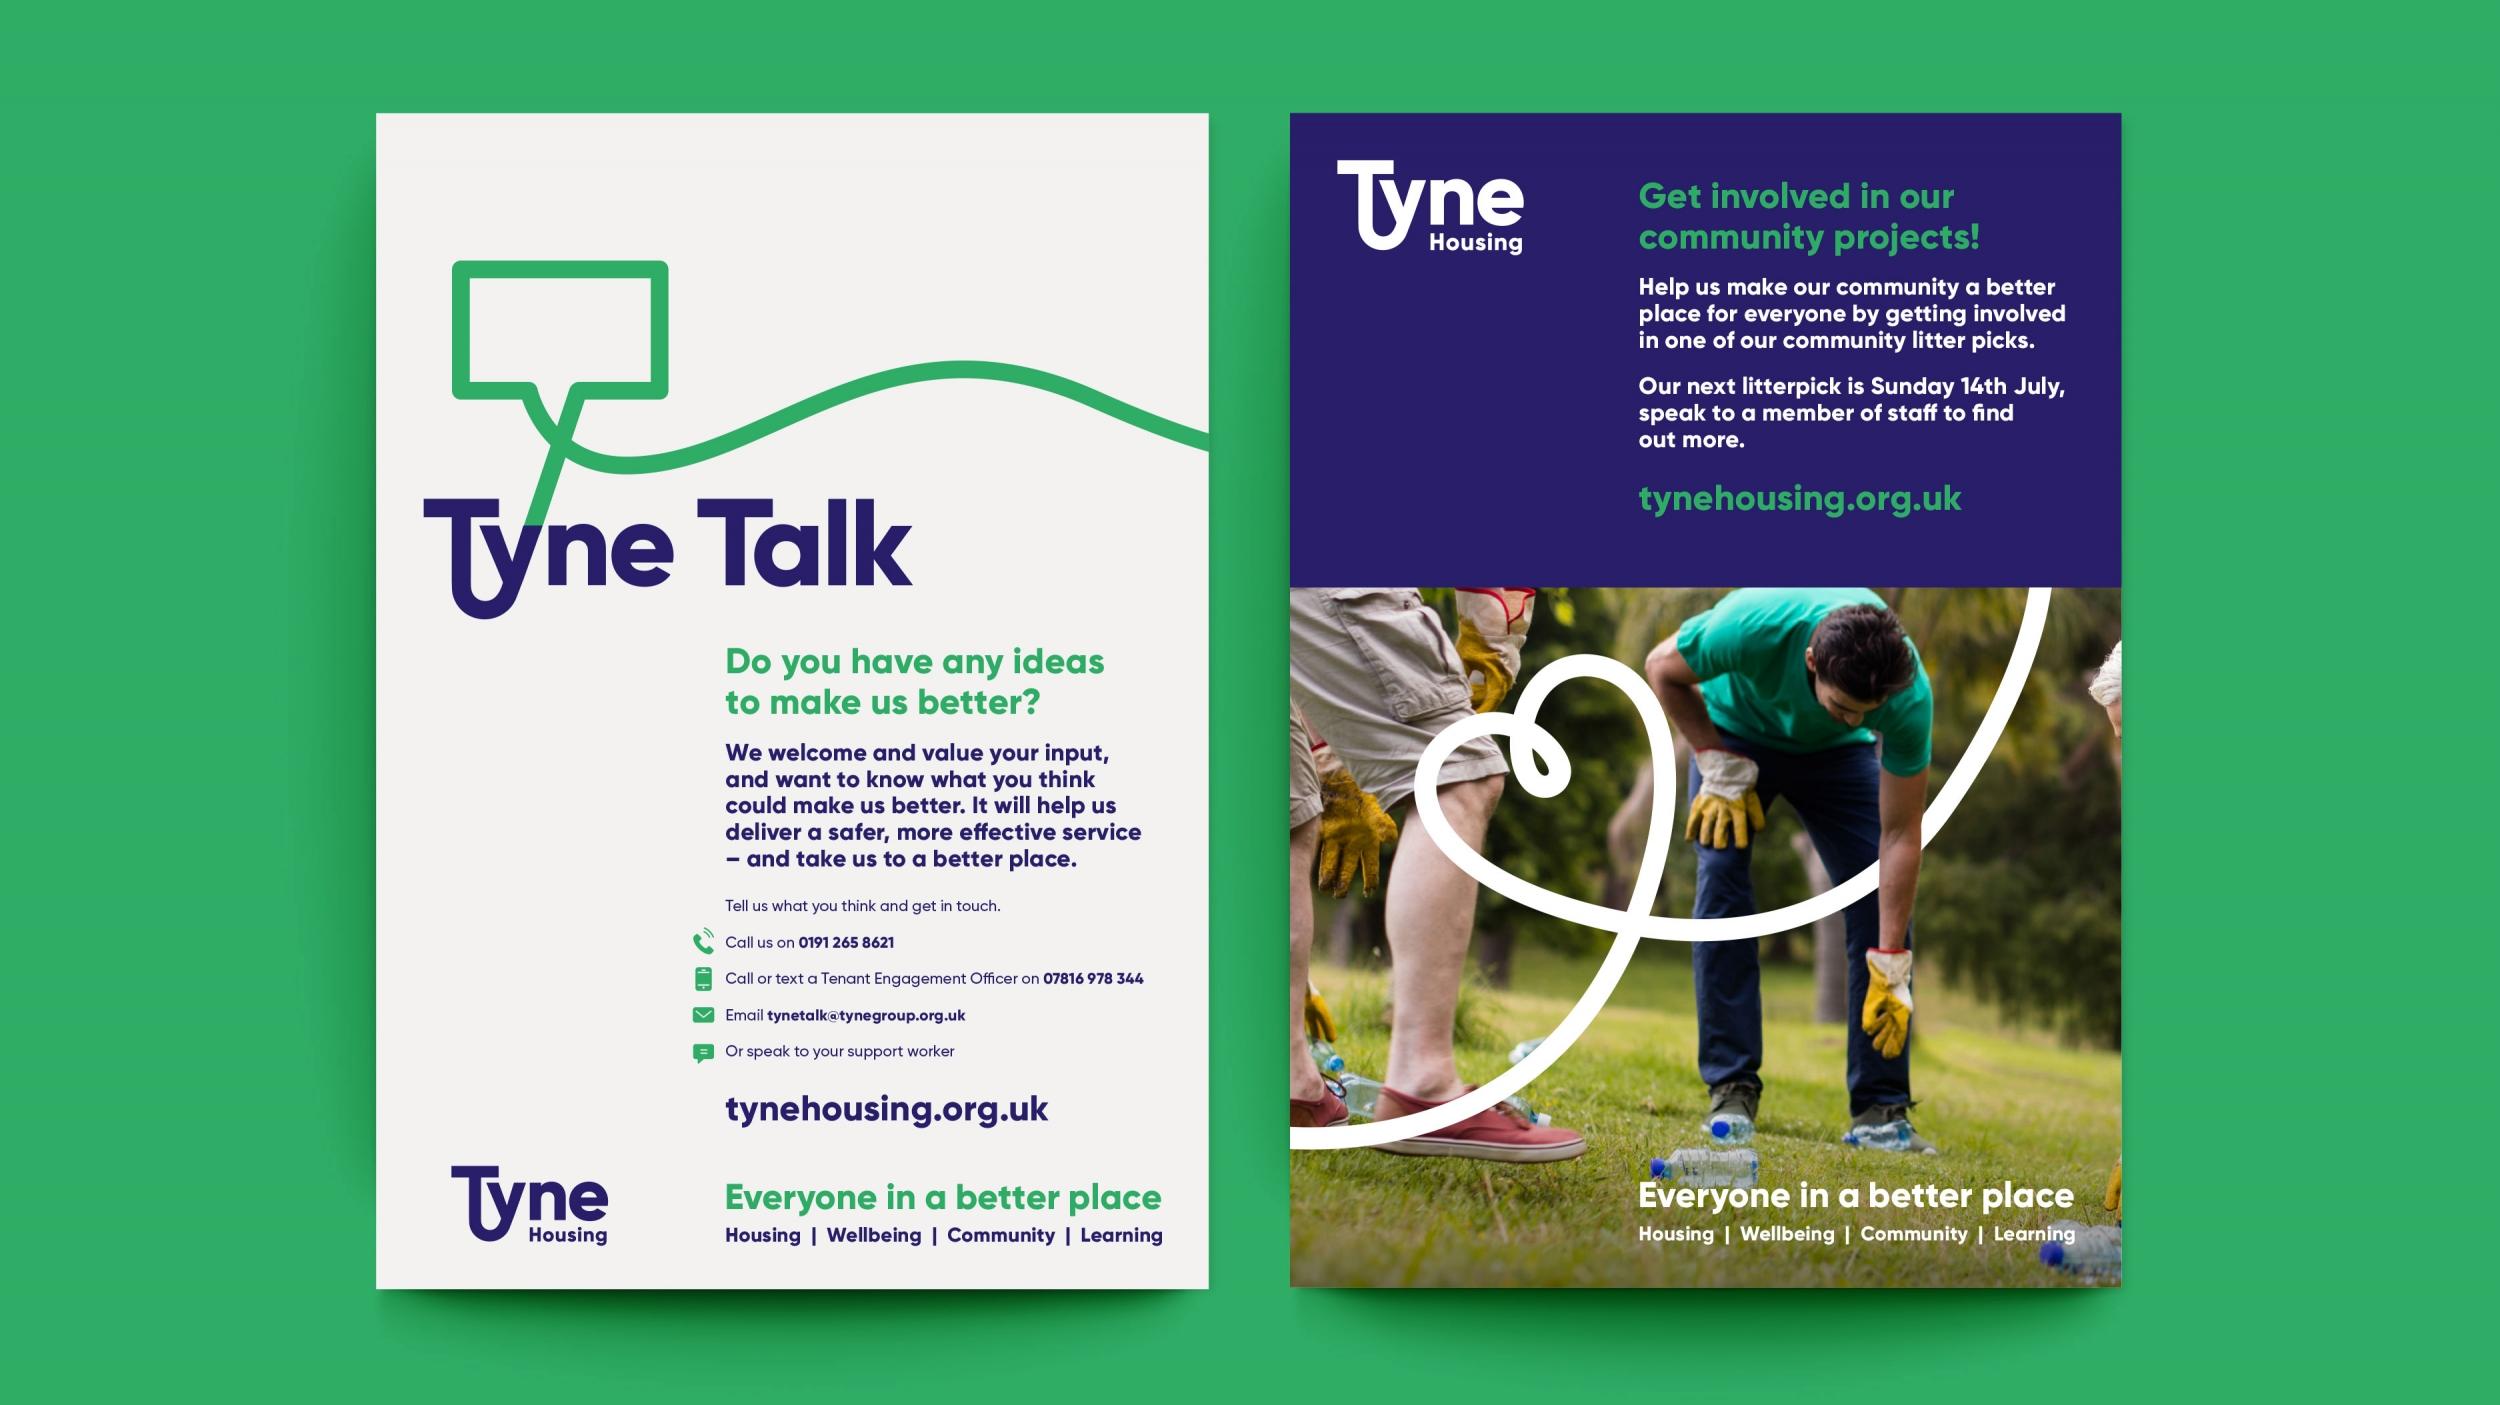 Tyne Housing association branding, logo and marketing communications by Altogether Creative.